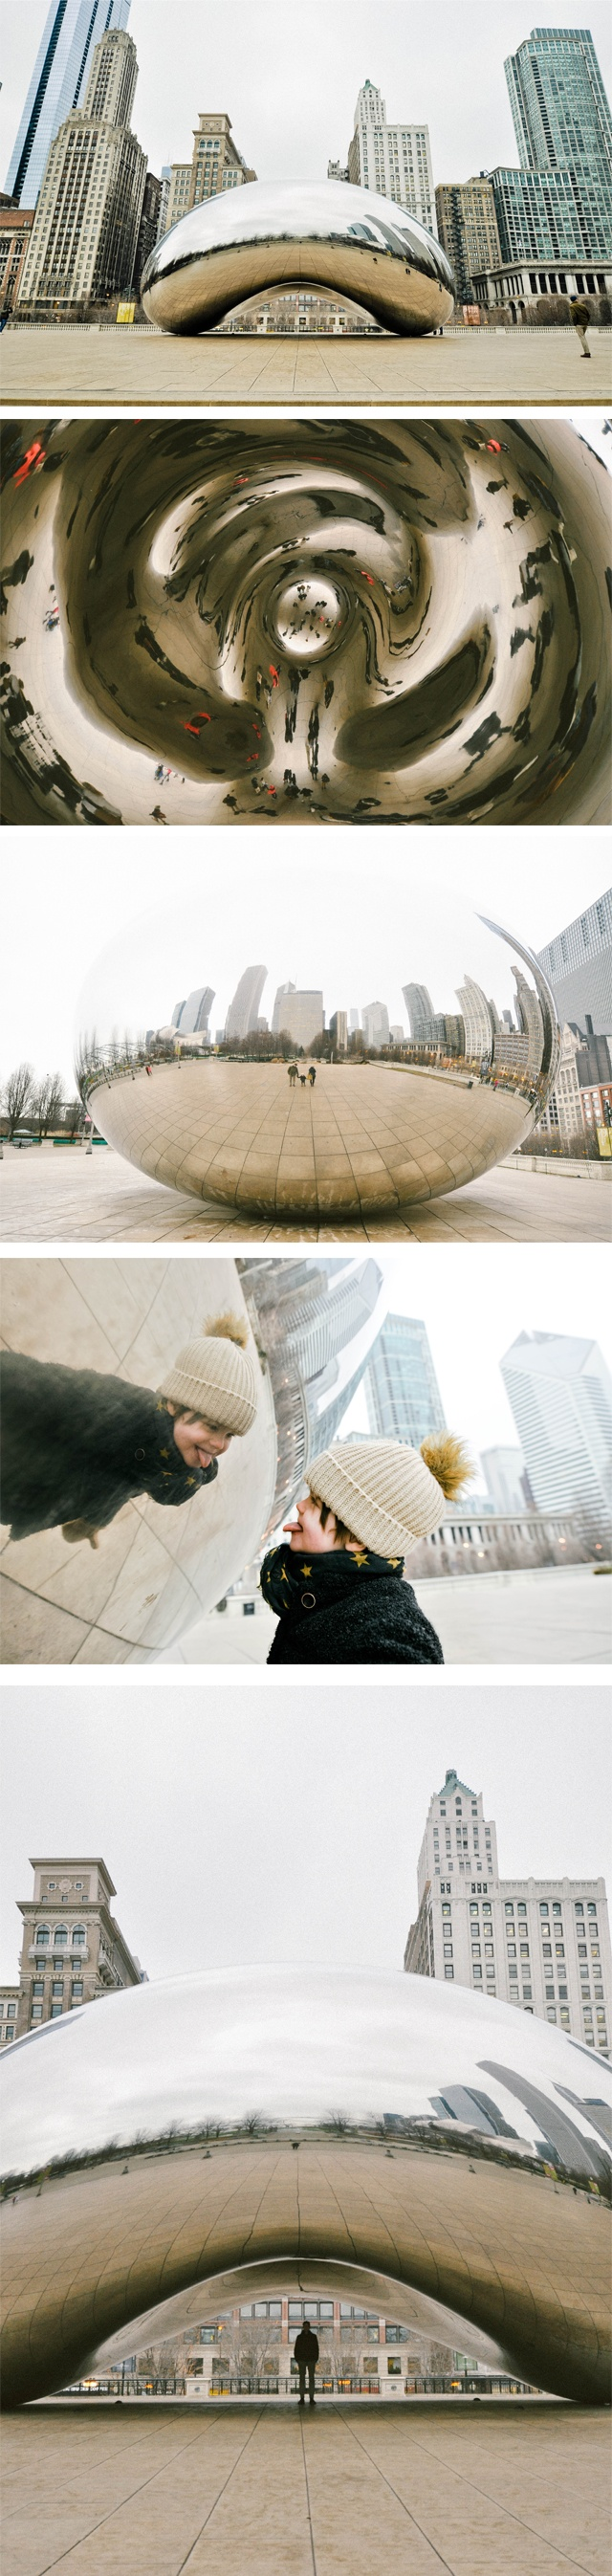 Chicago, Illinois, The Bean (Cloud Gate)